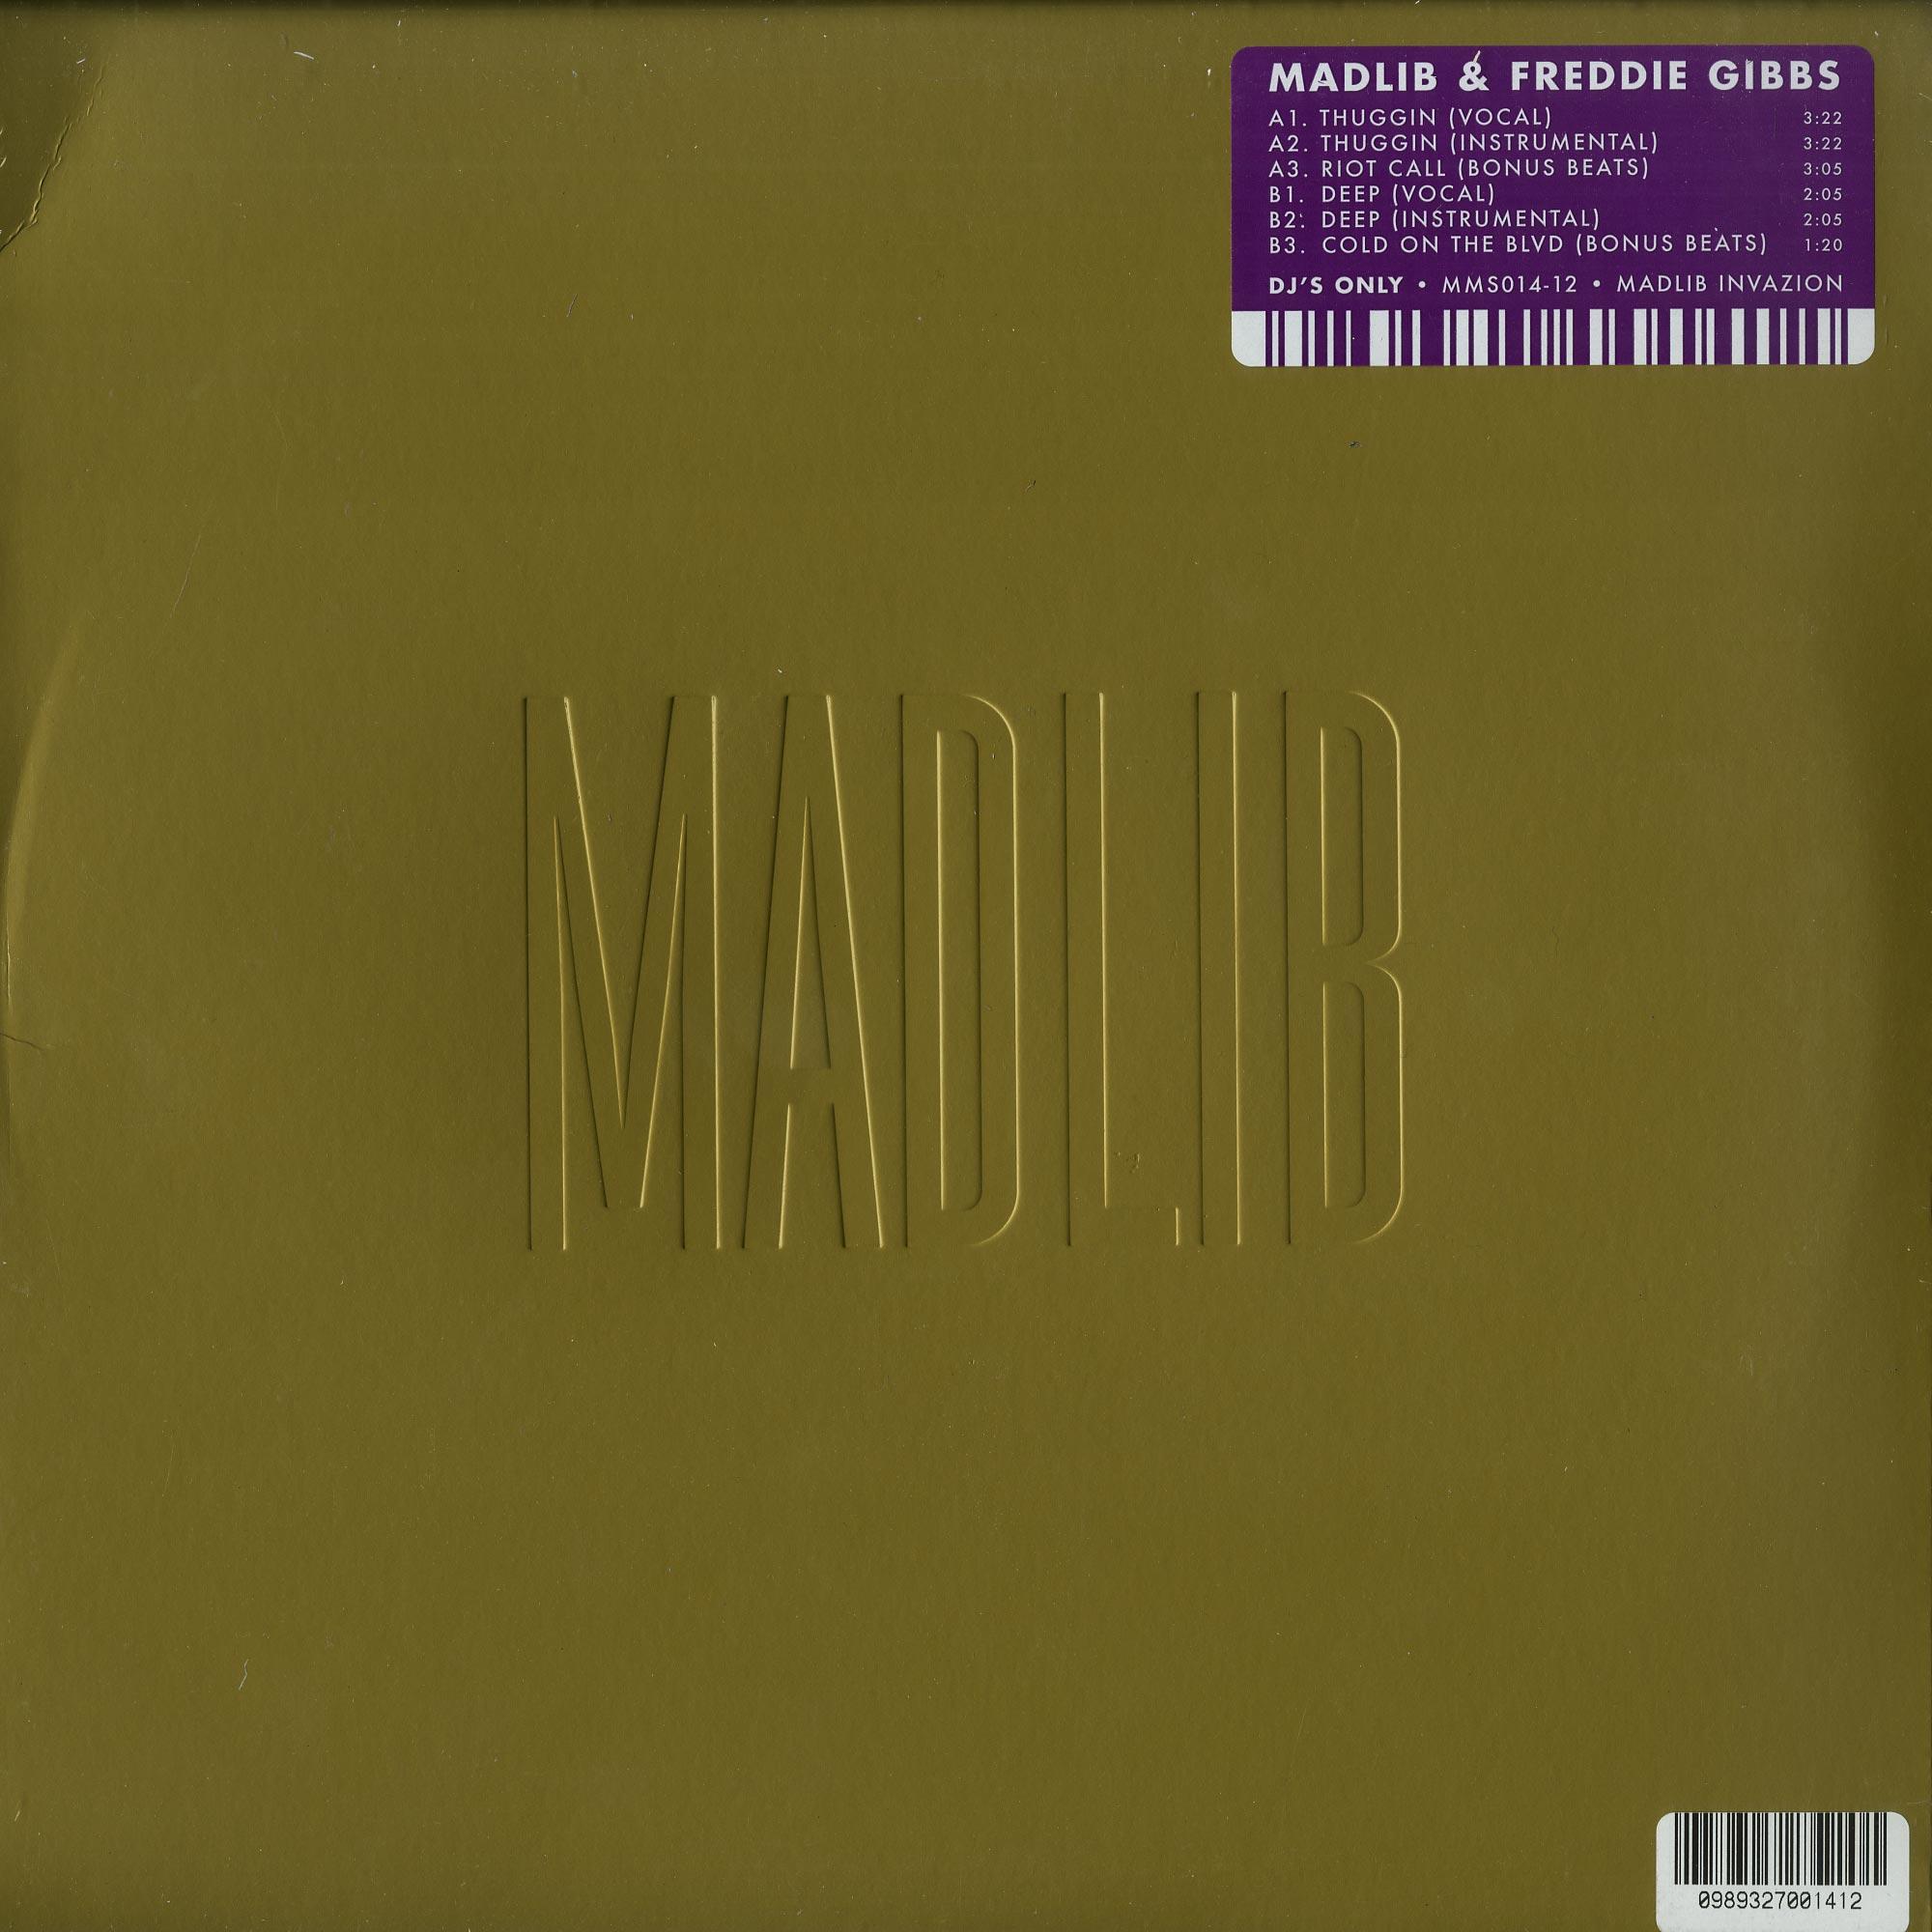 Madlib & Freddie Gibbs - THUGGIN EP